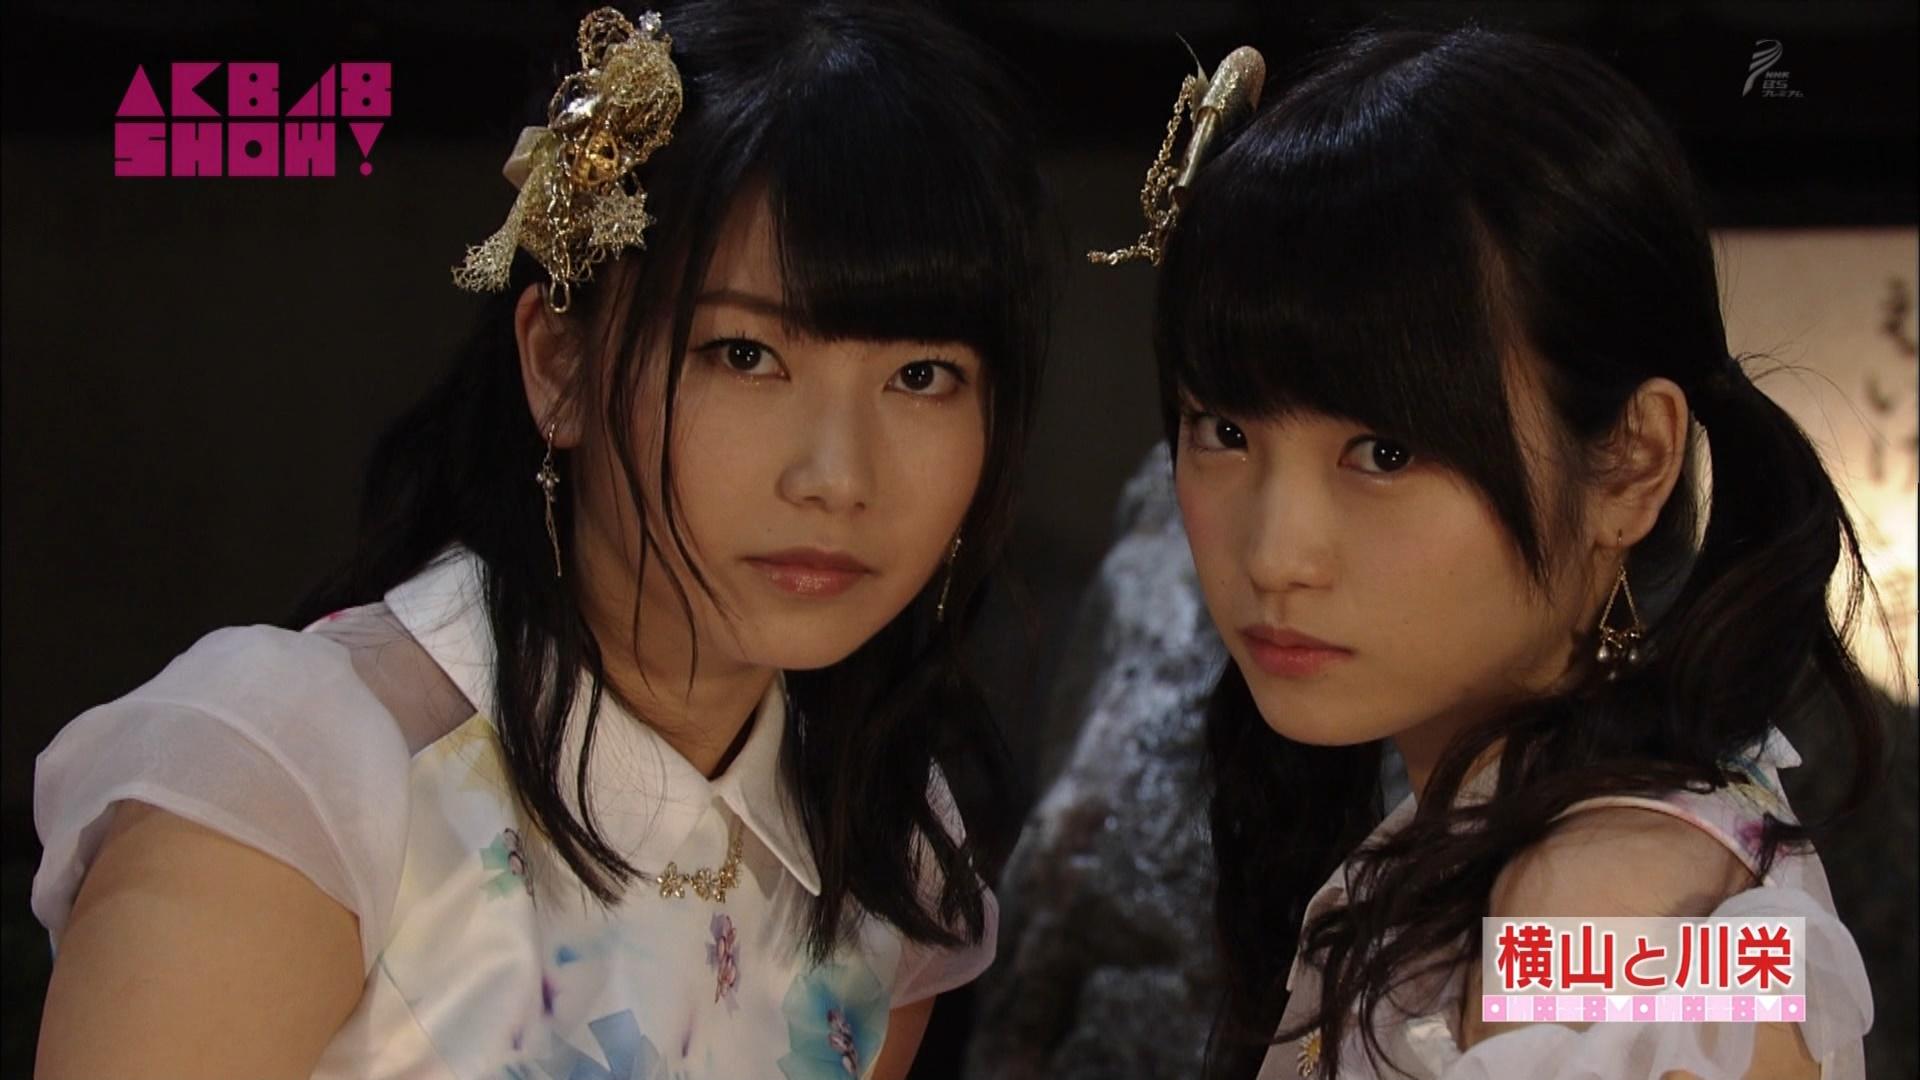 横山由依と川栄李奈 AKB48SHOW! 20140906 (56)